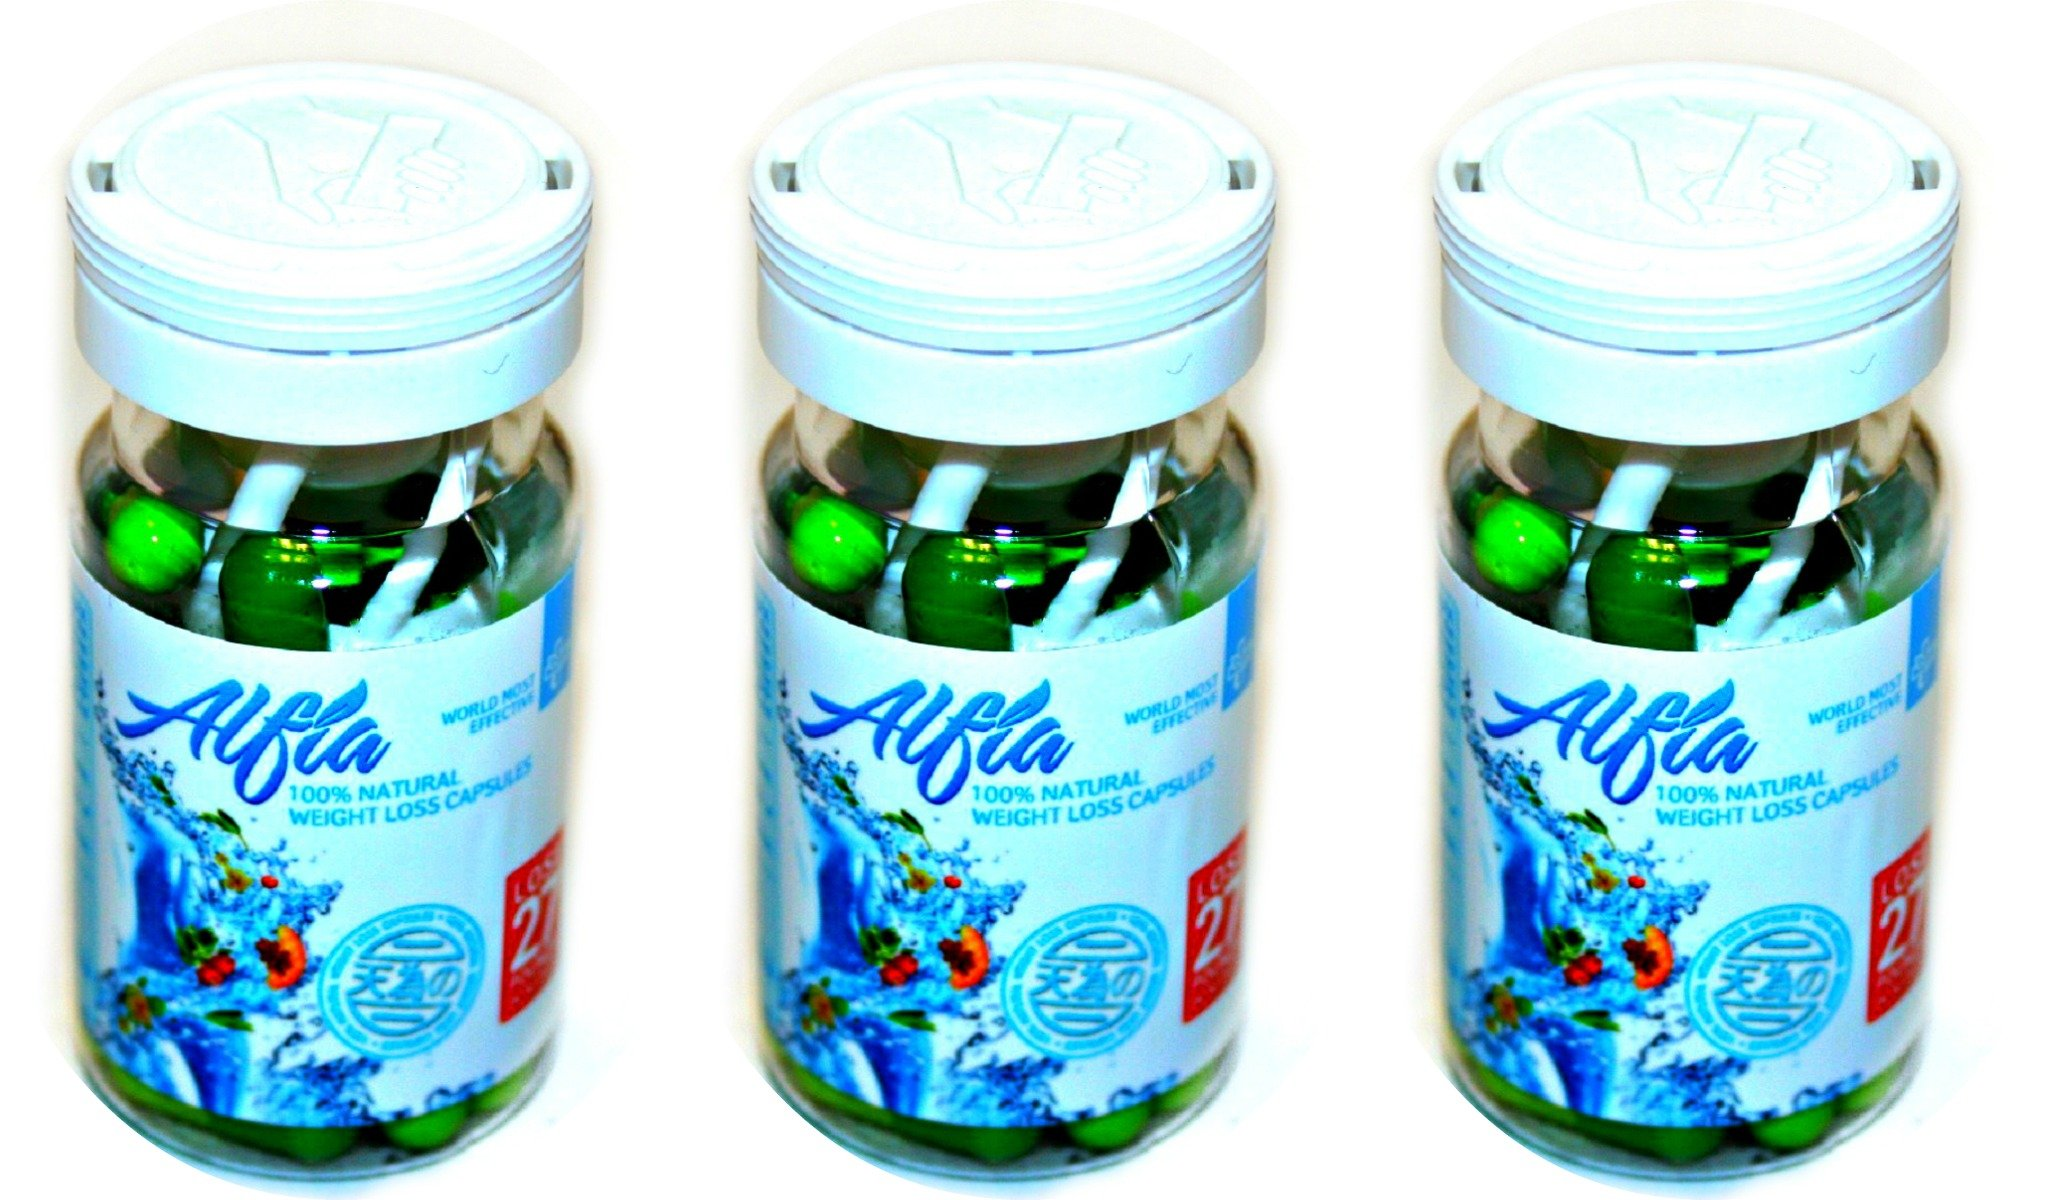 Alfia 100% Natural Weight Loss Capsules